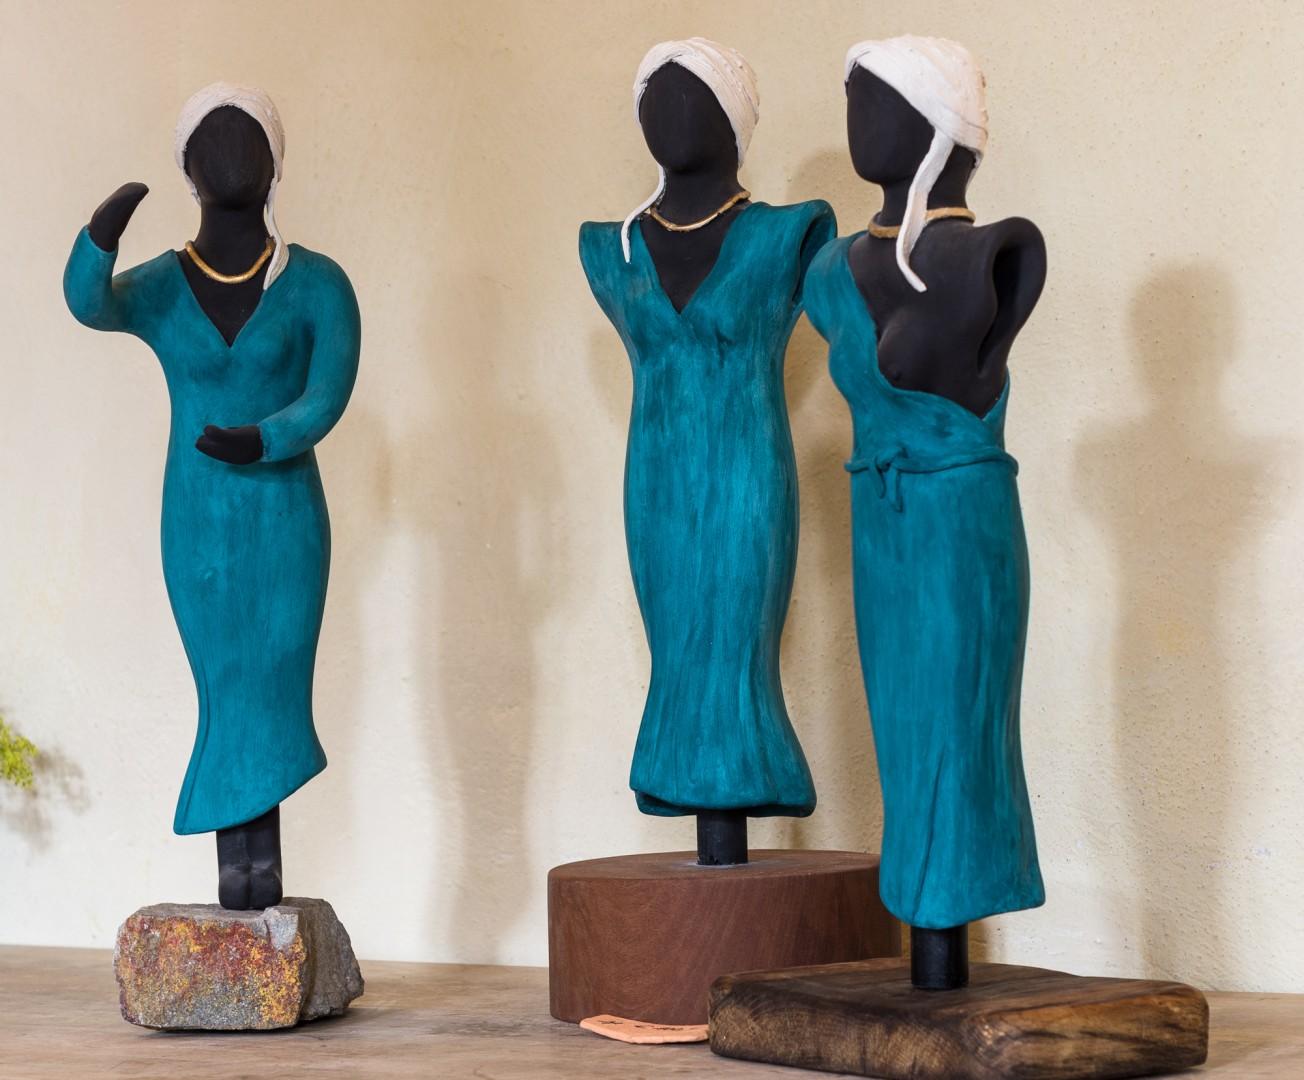 Keramikskulpturen auf Holz-/Steinfuß, Höhe ca. 40 cm